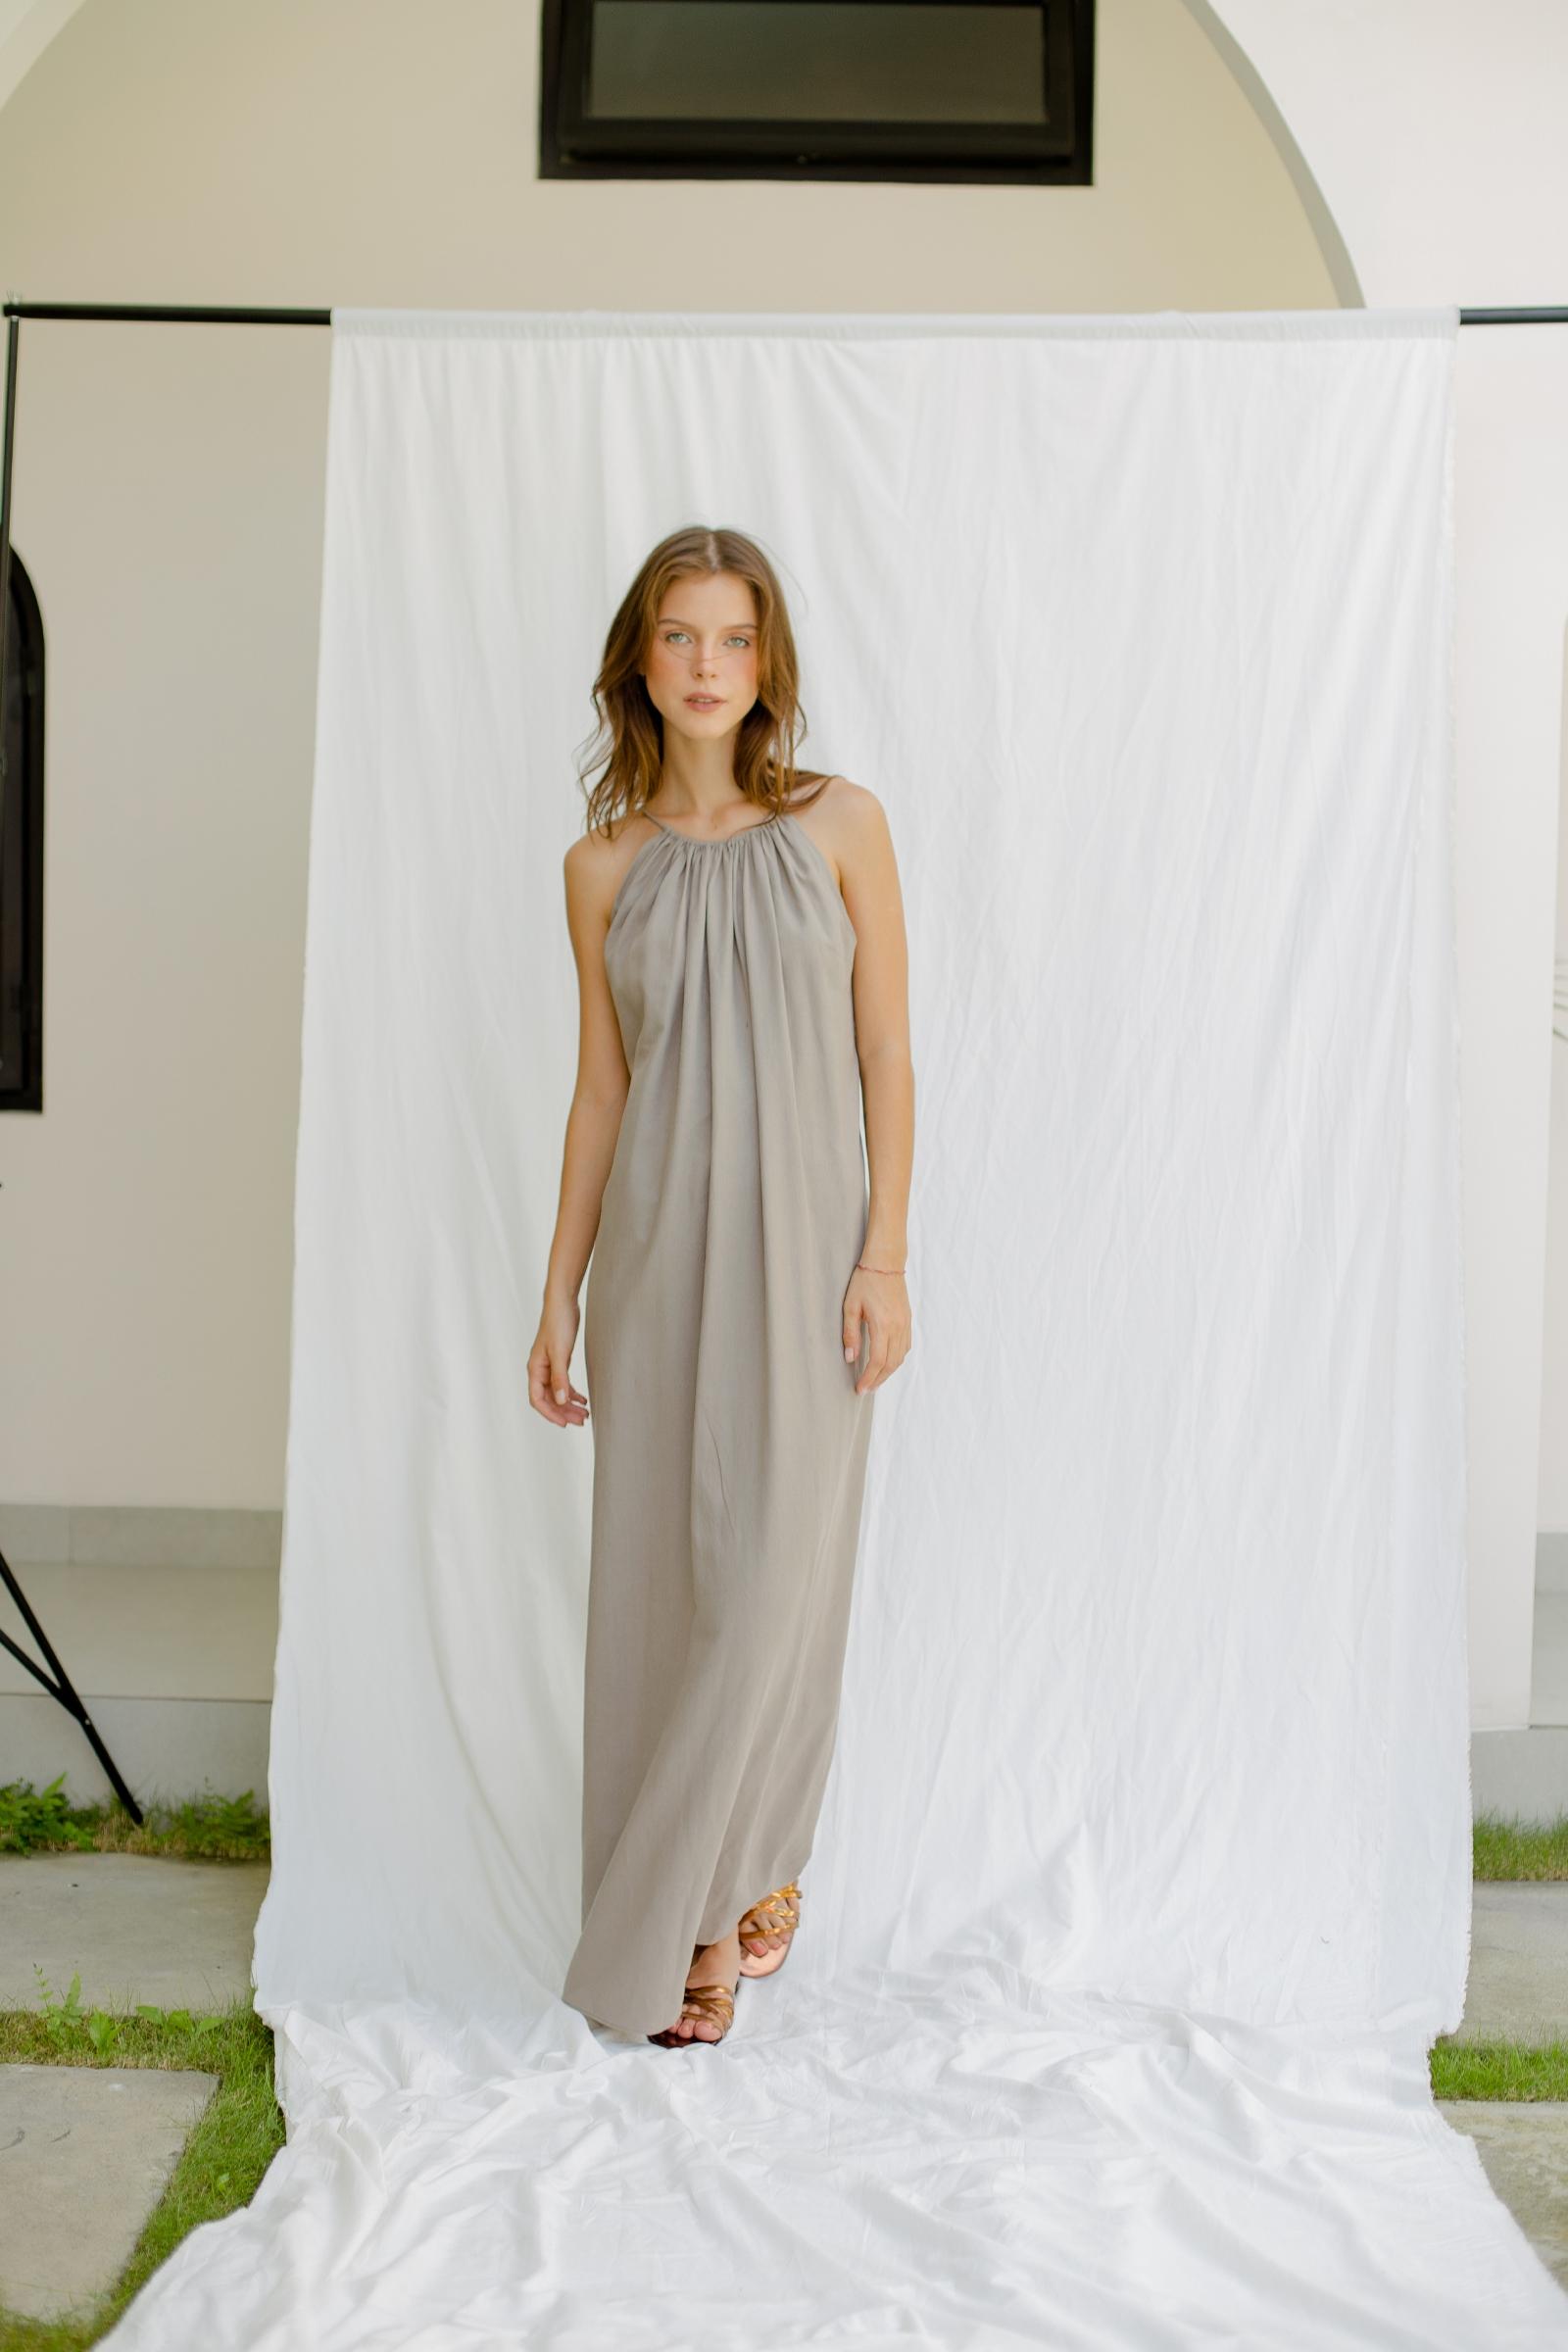 Picture of Calithea Maxi Dress Grey Khaki